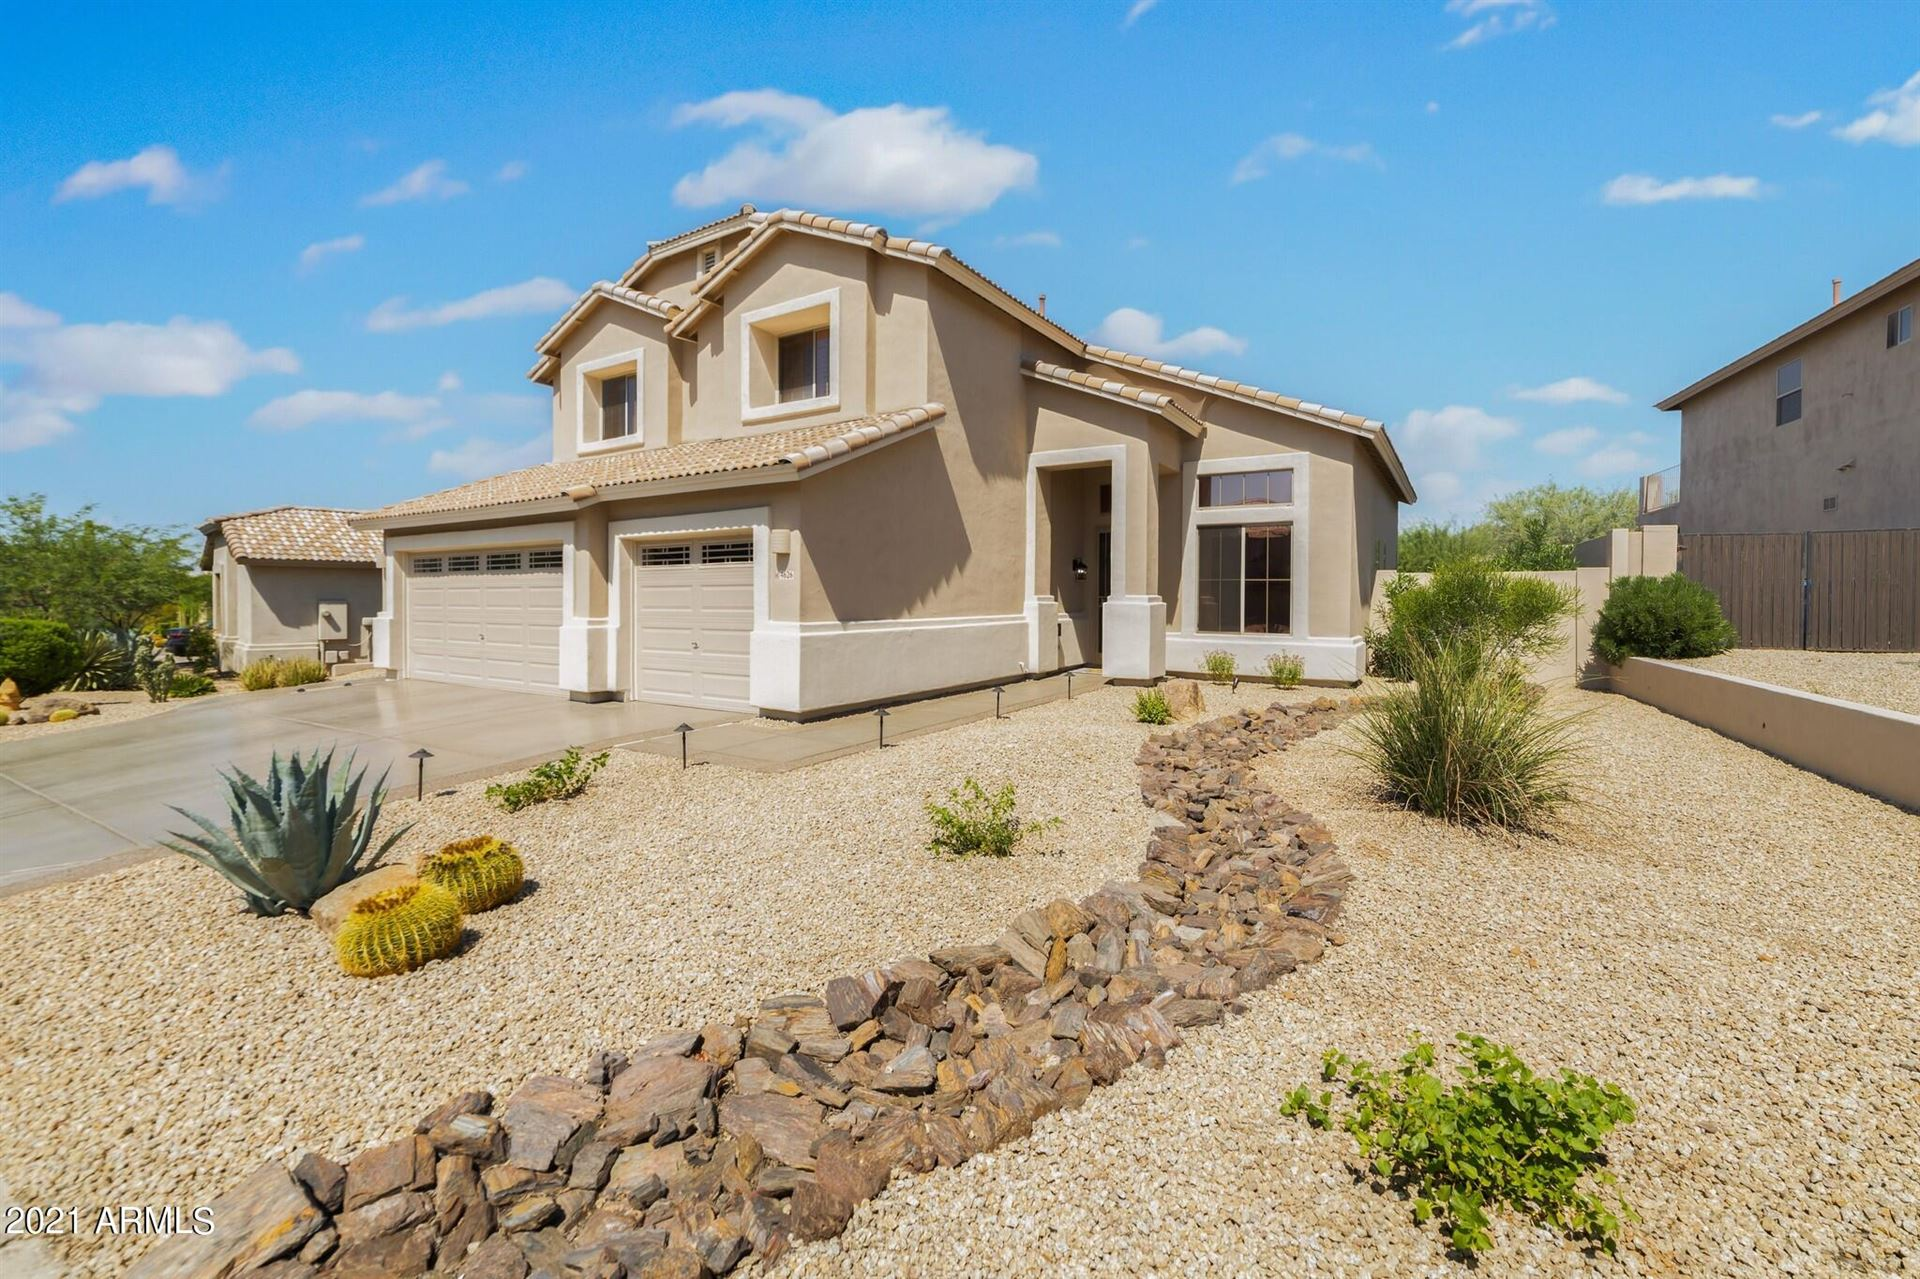 Photo of 4626 E TUMBLEWEED Drive, Cave Creek, AZ 85331 (MLS # 6290239)